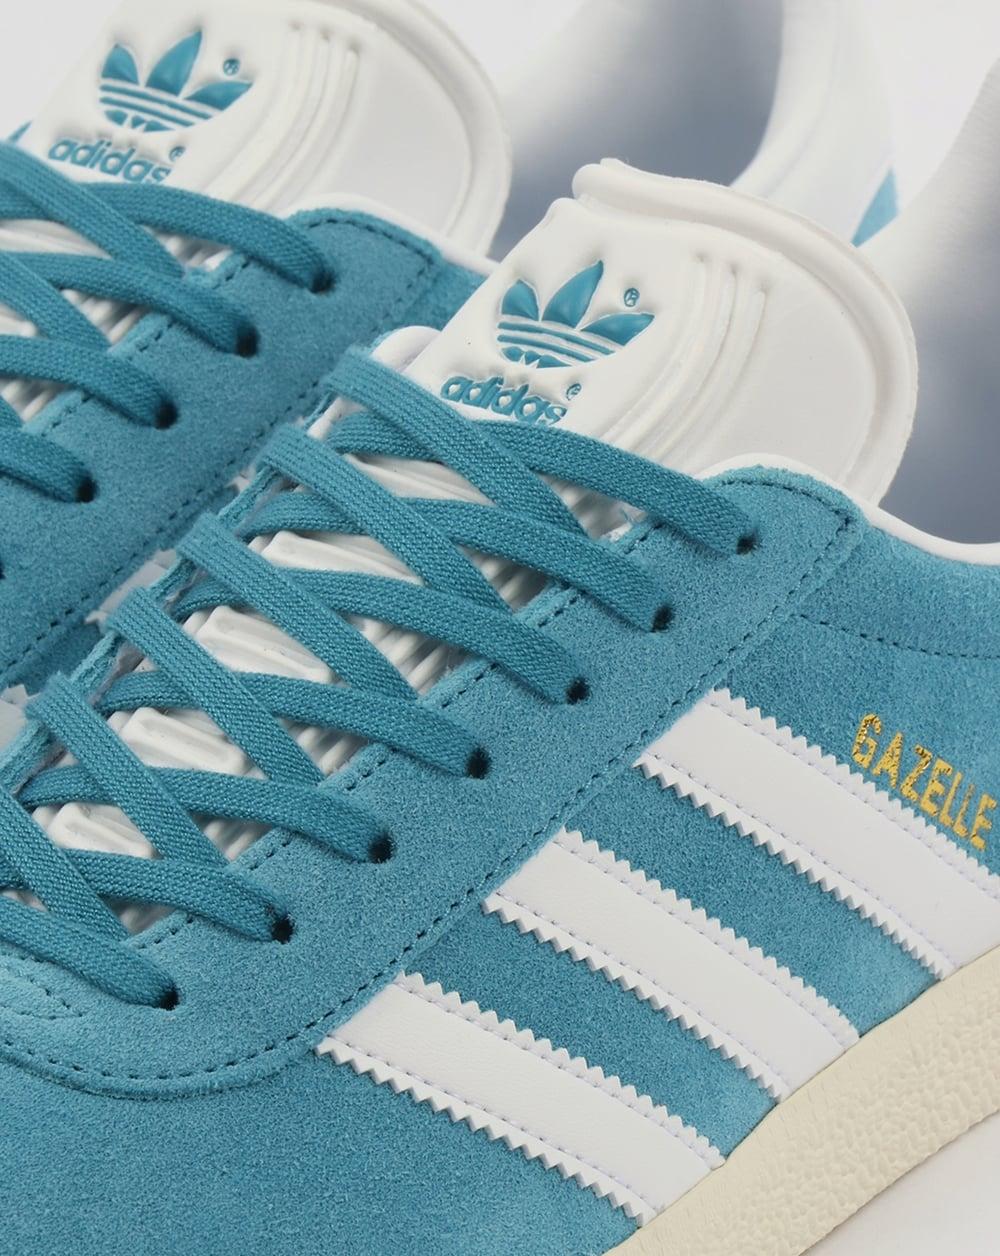 Adidas Gazelle Trainers Tactile Steel/White,blue,originals ... Caterpillar Shoes